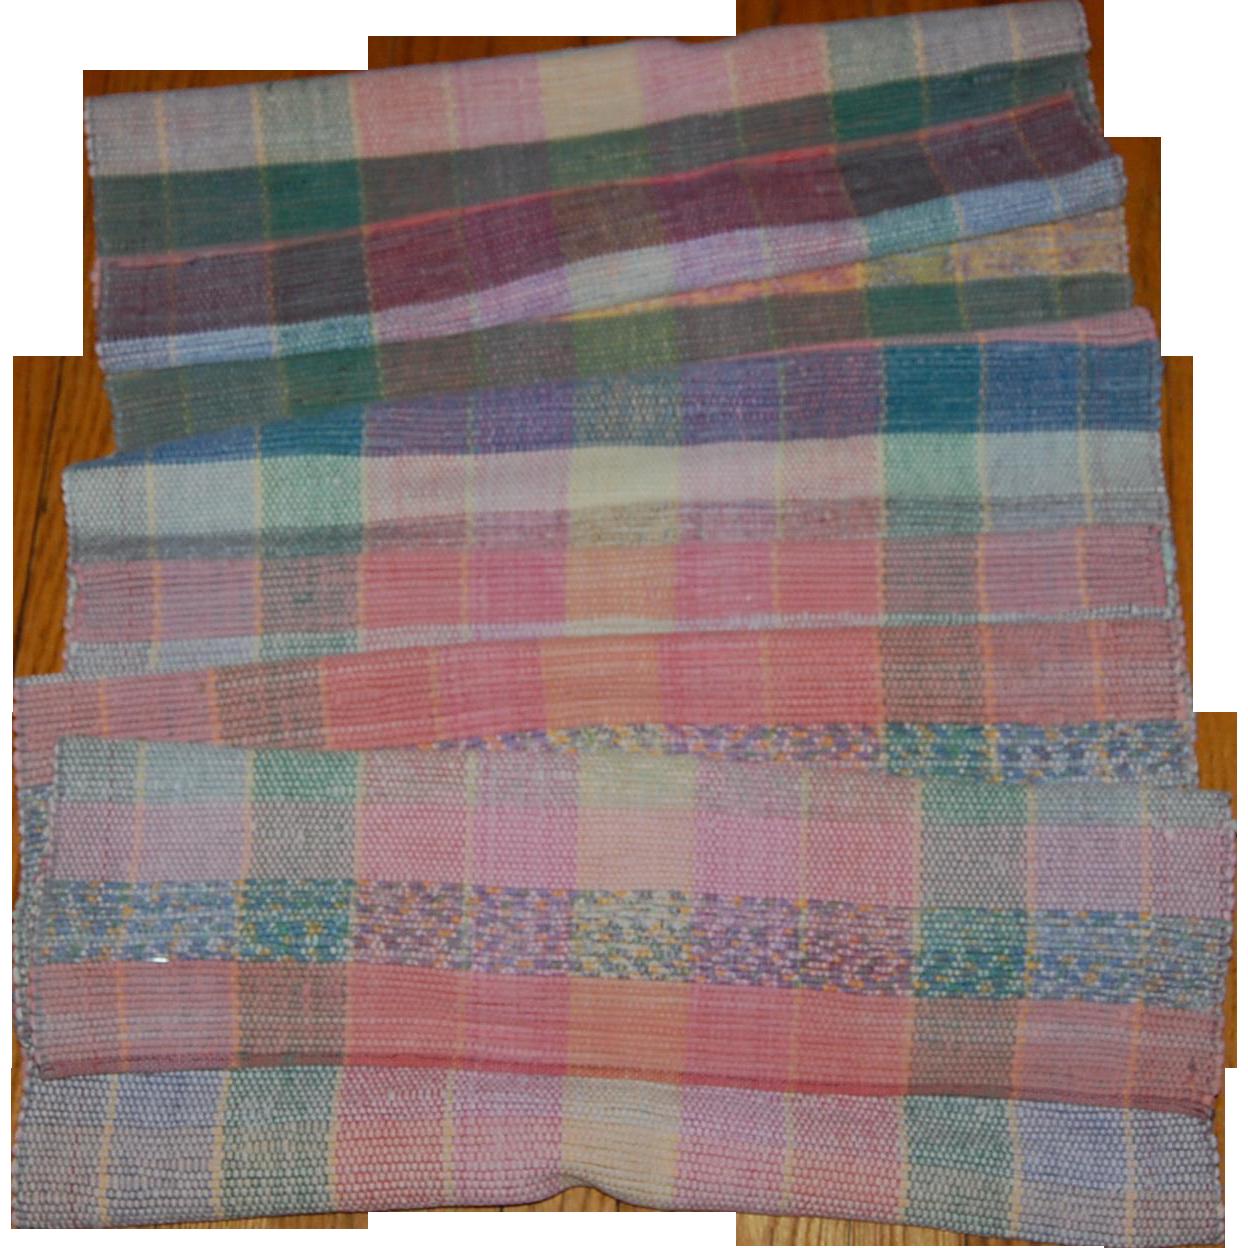 Vintage Rag Runner Rug In Pastels 9 Ft From